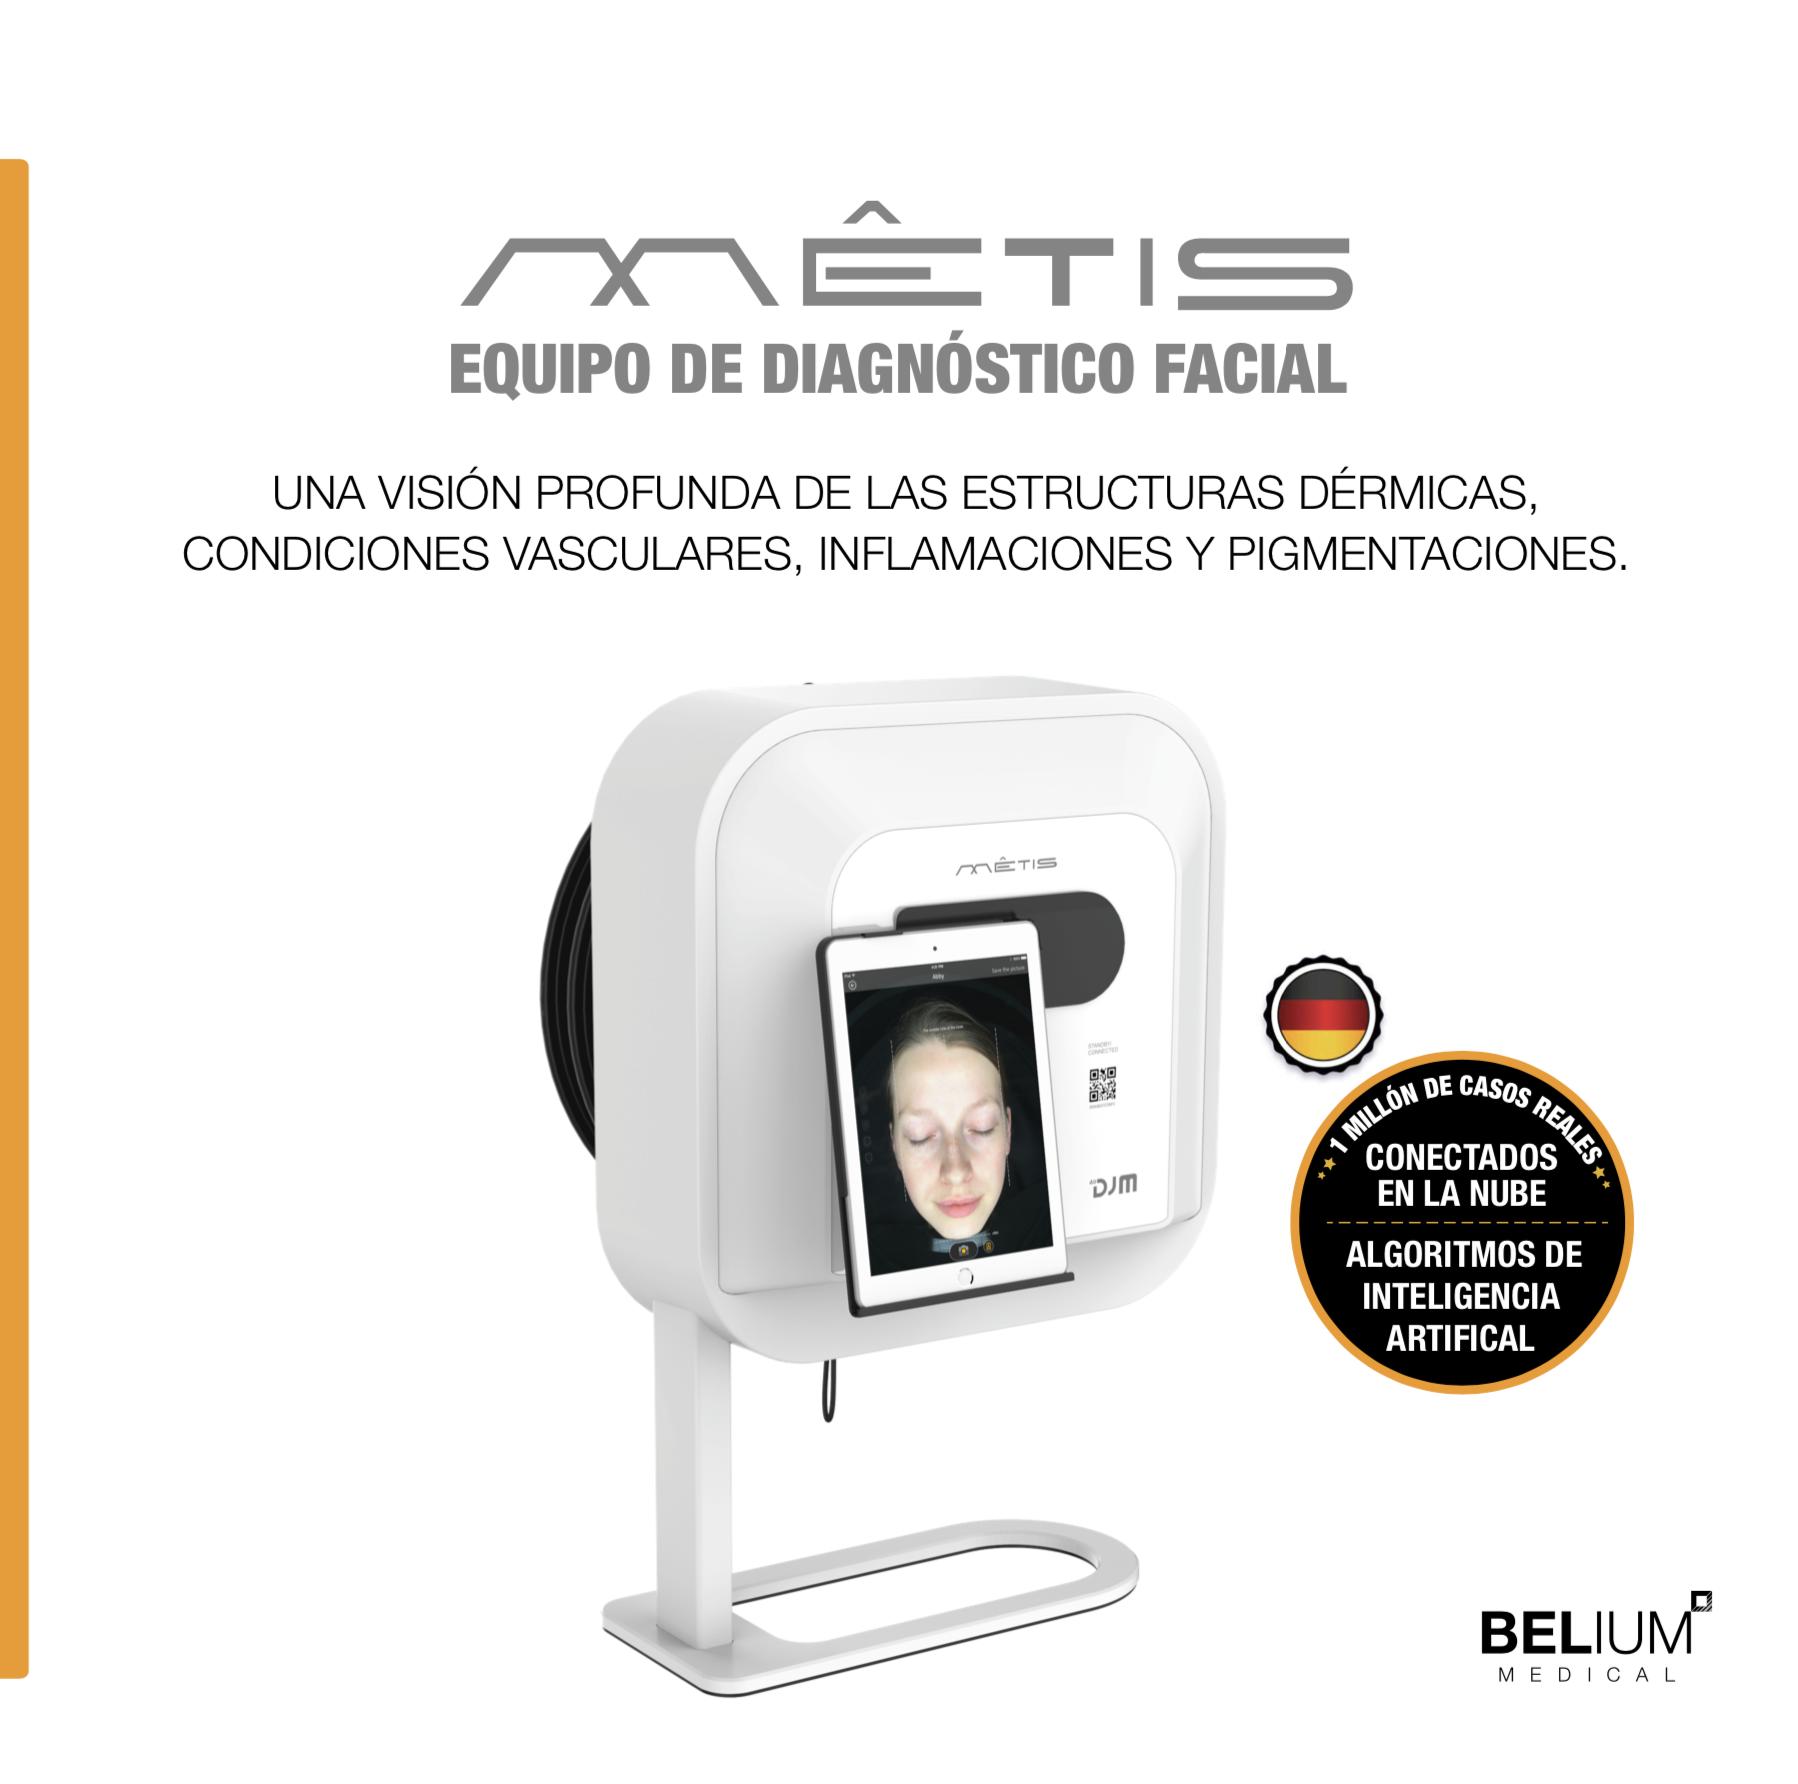 metis analizador facial diagnostico